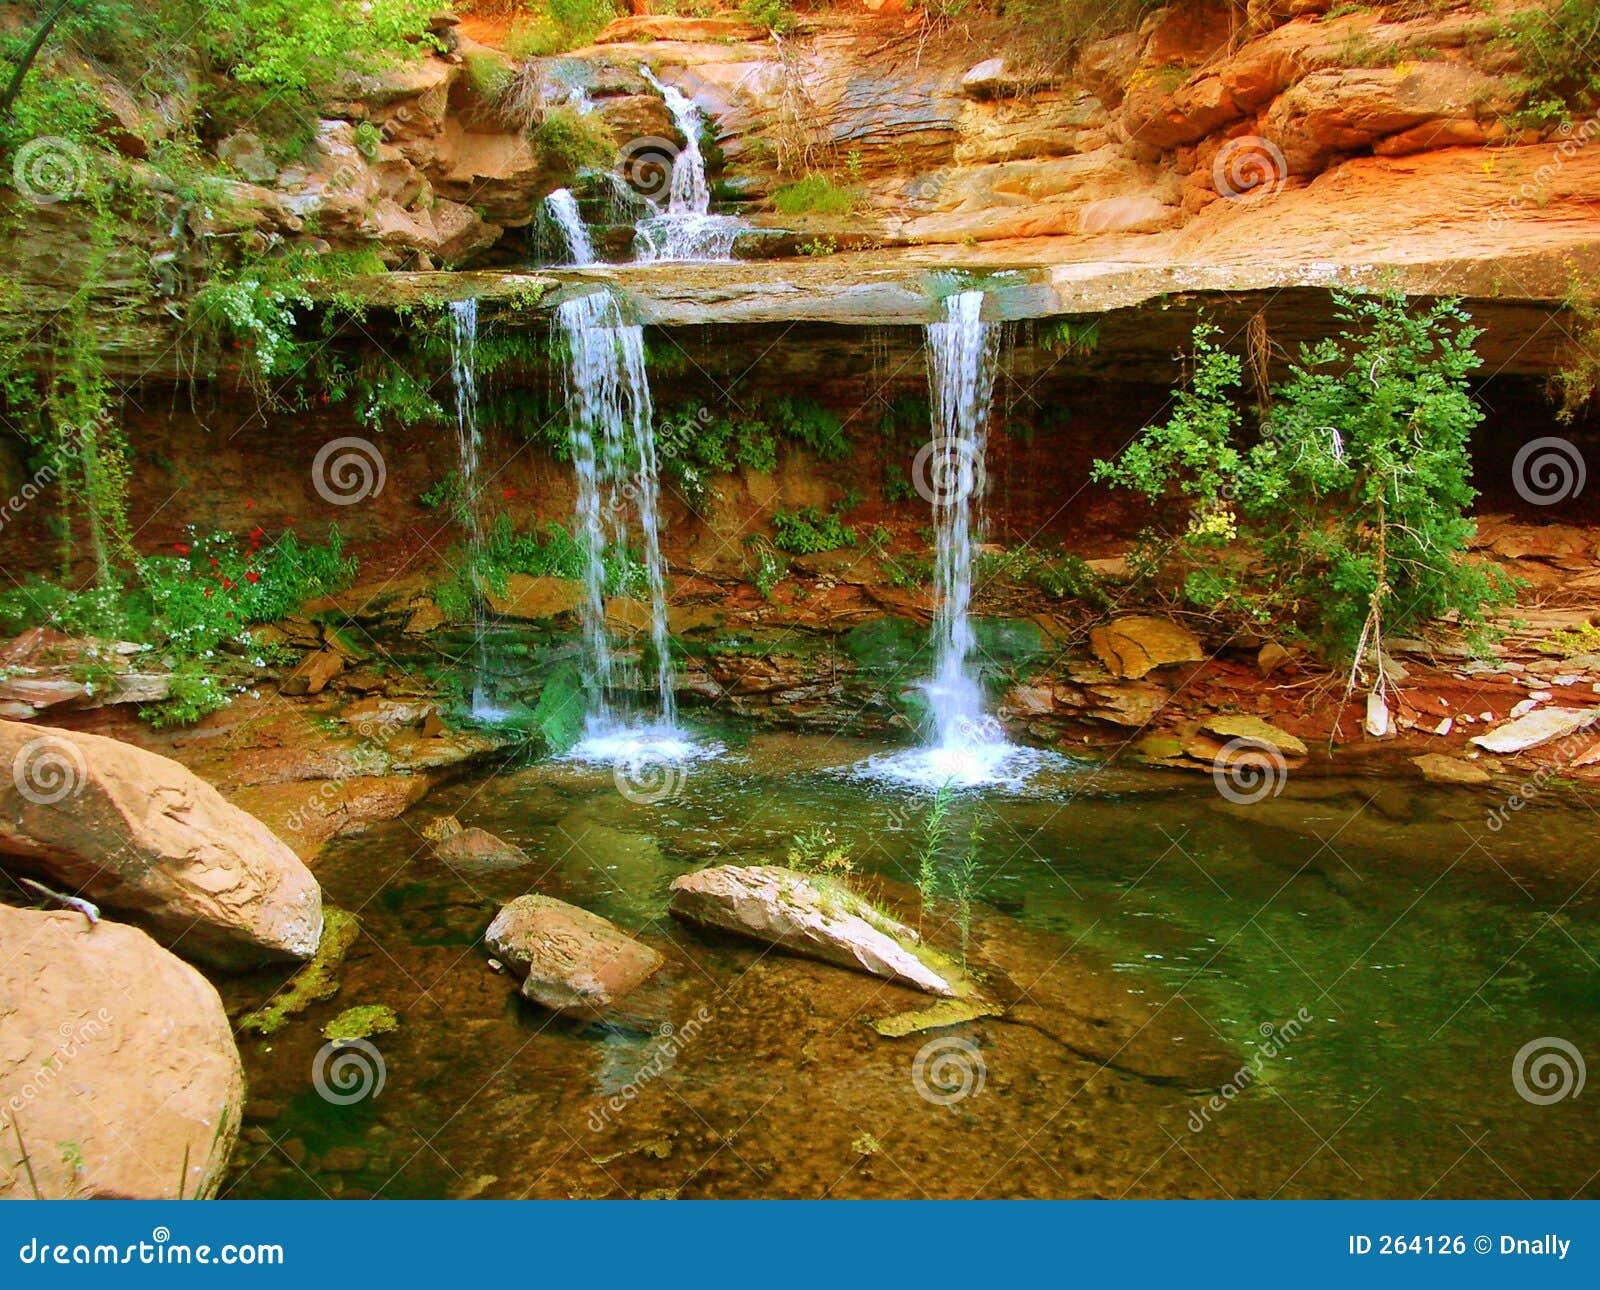 Zion Double Falls